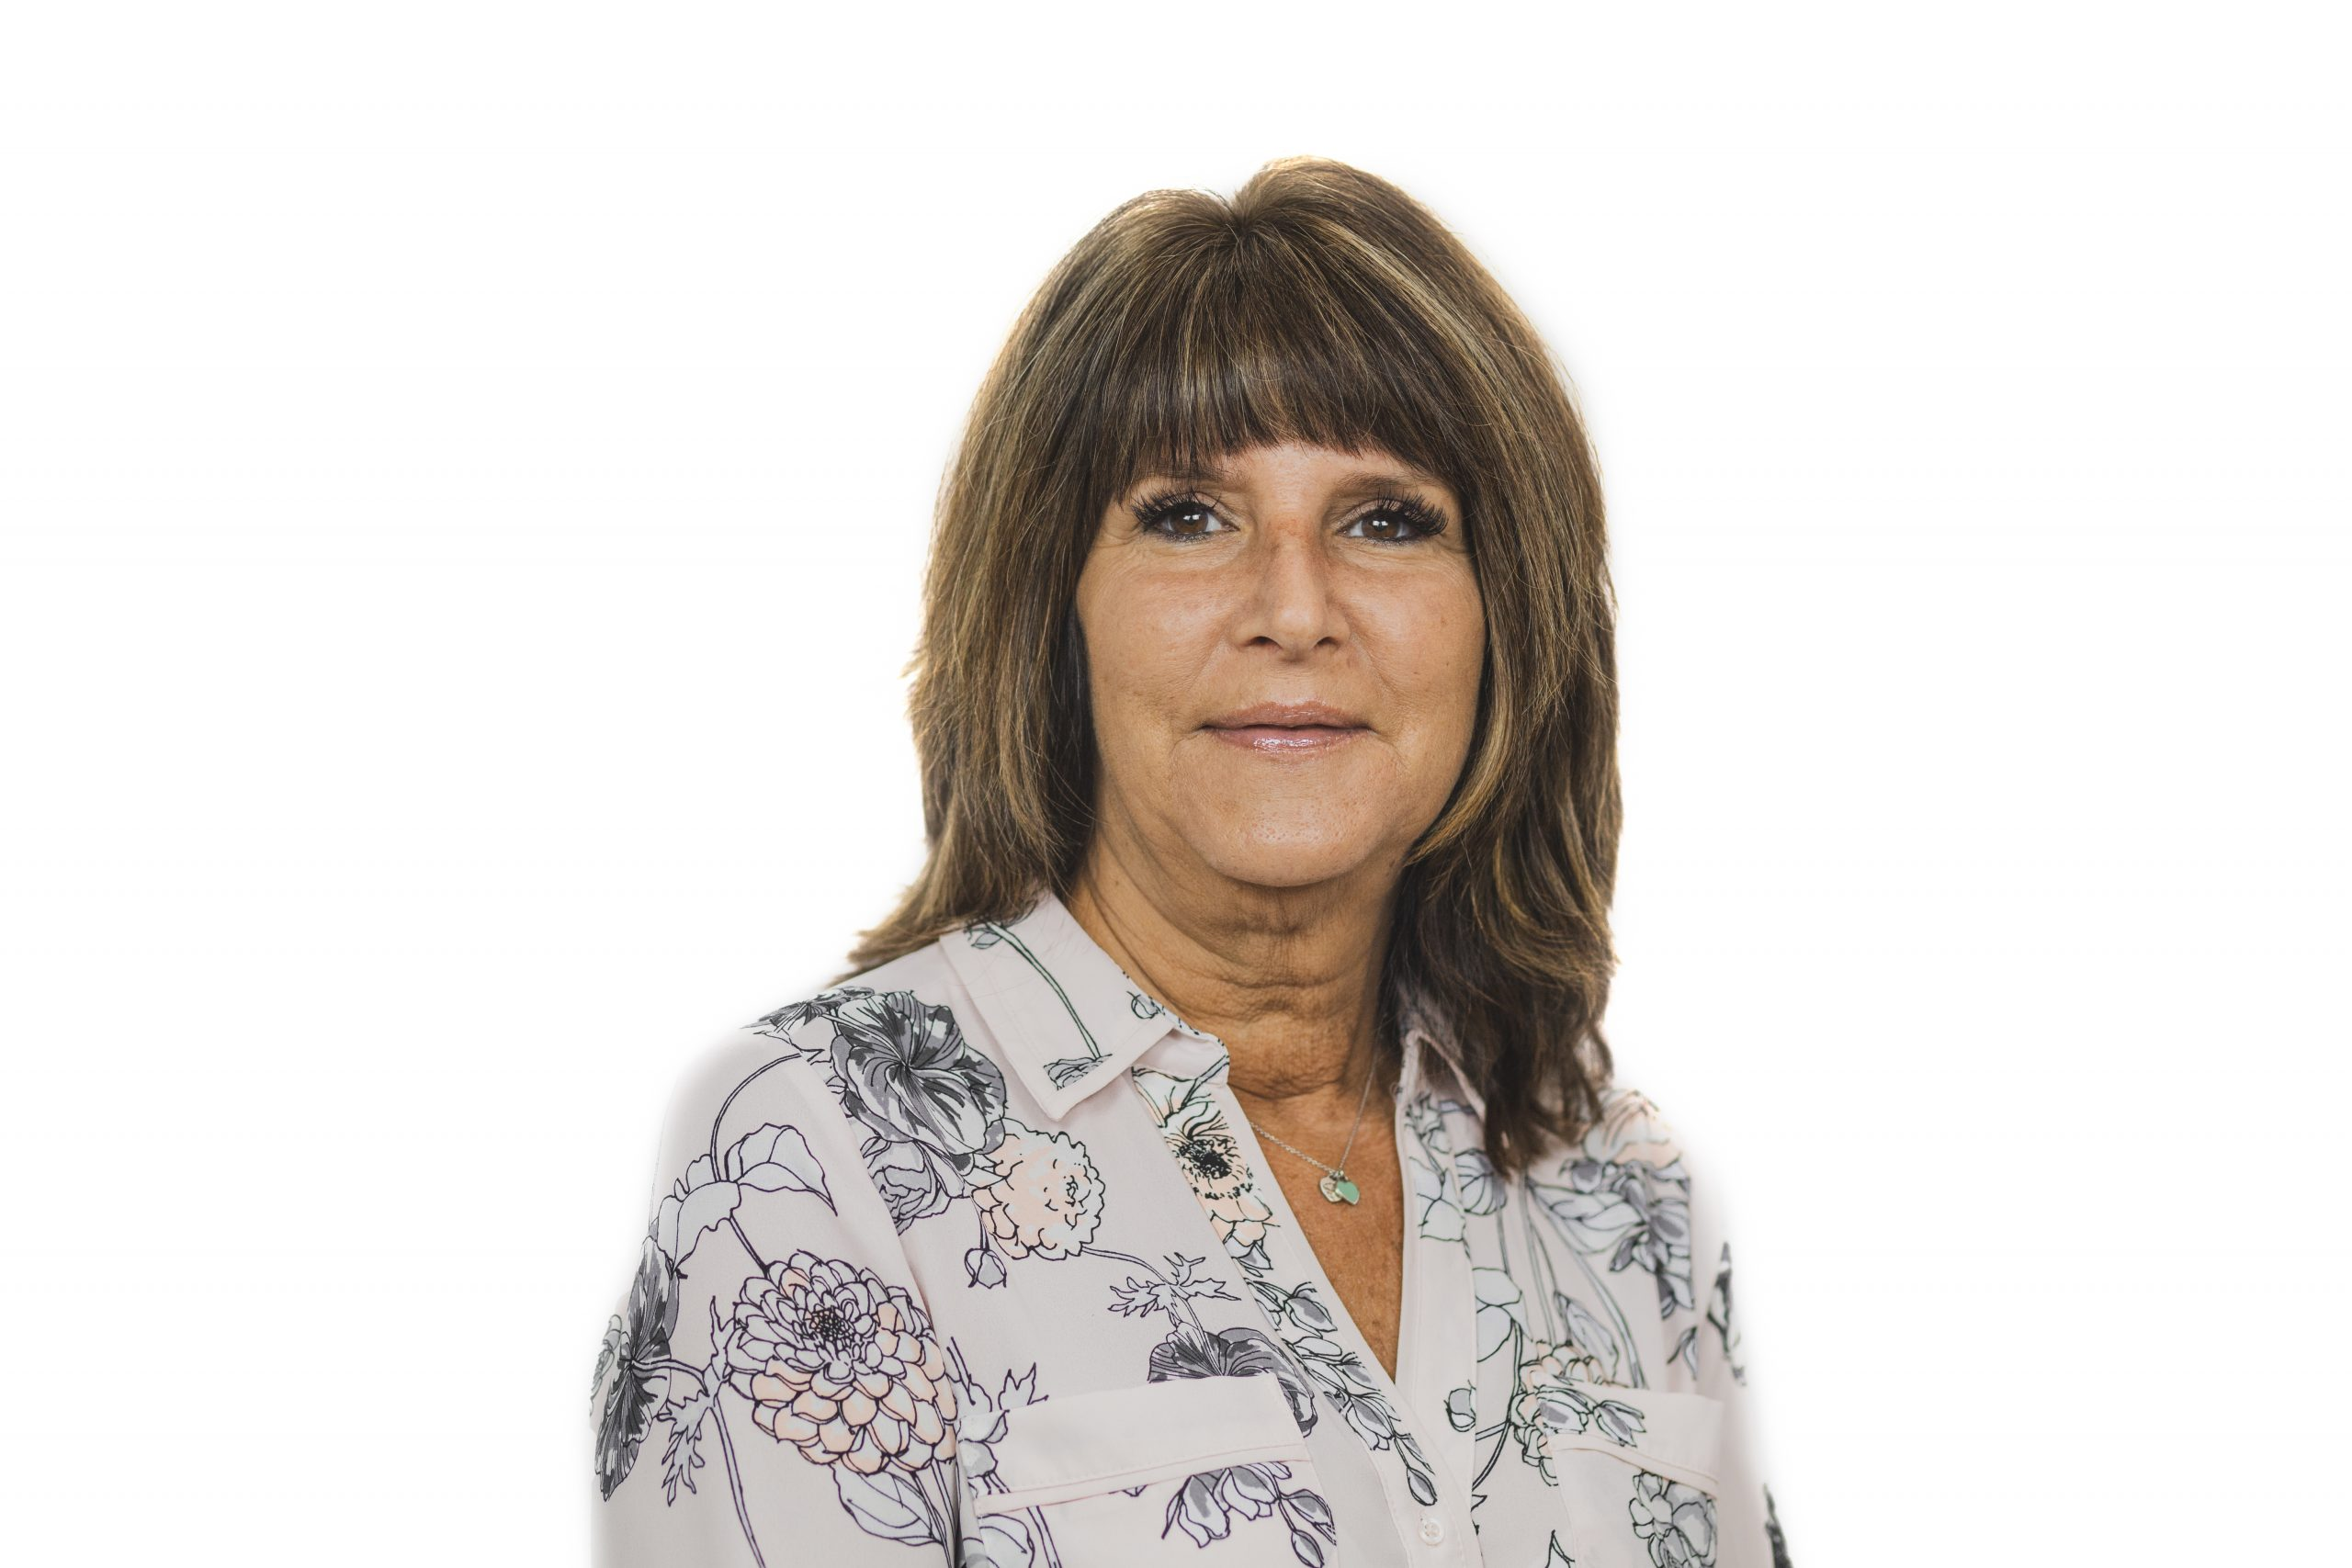 Linda Psaras